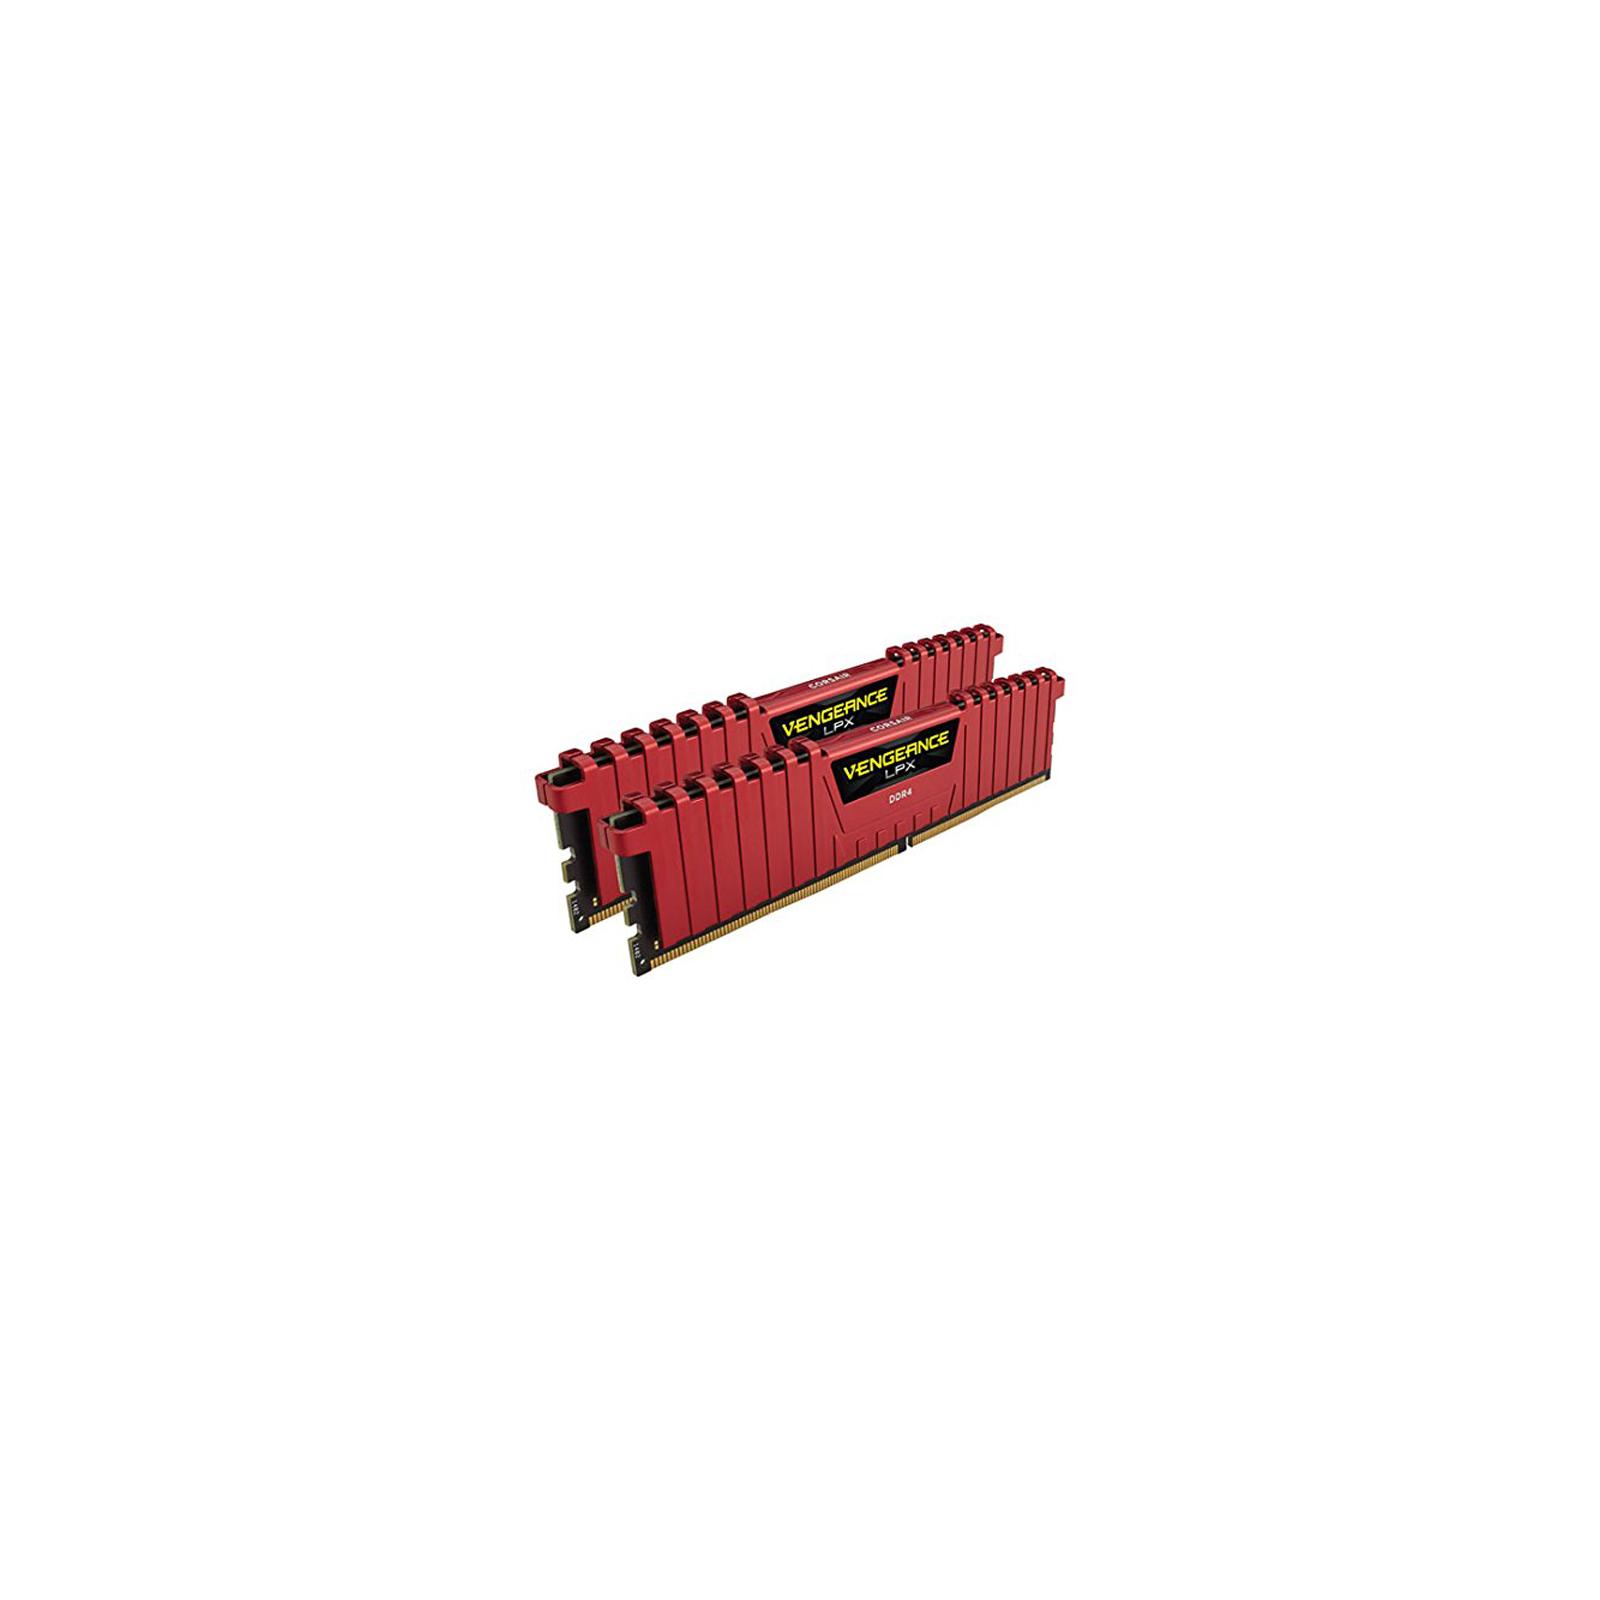 Модуль памяти для компьютера DDR4 16GB (2x8GB) 3200 MHz Vengeance LPX Red CORSAIR (CMK16GX4M2B3200C16R) изображение 3